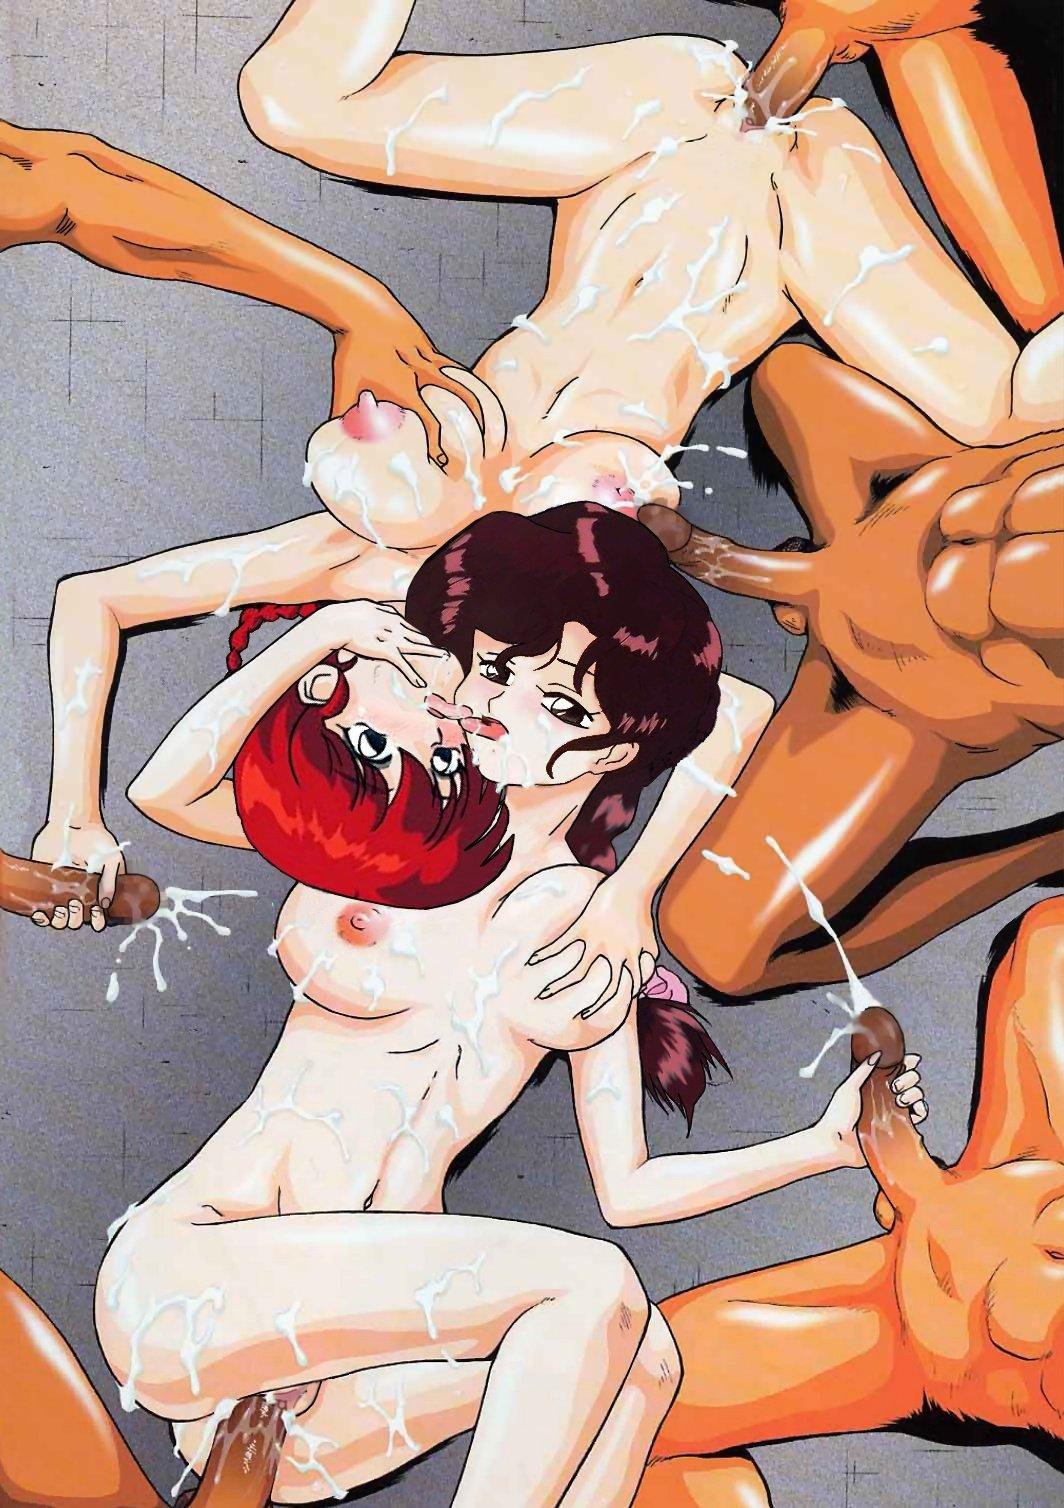 ranma nudity 1/2 Eris billy and mandy wiki